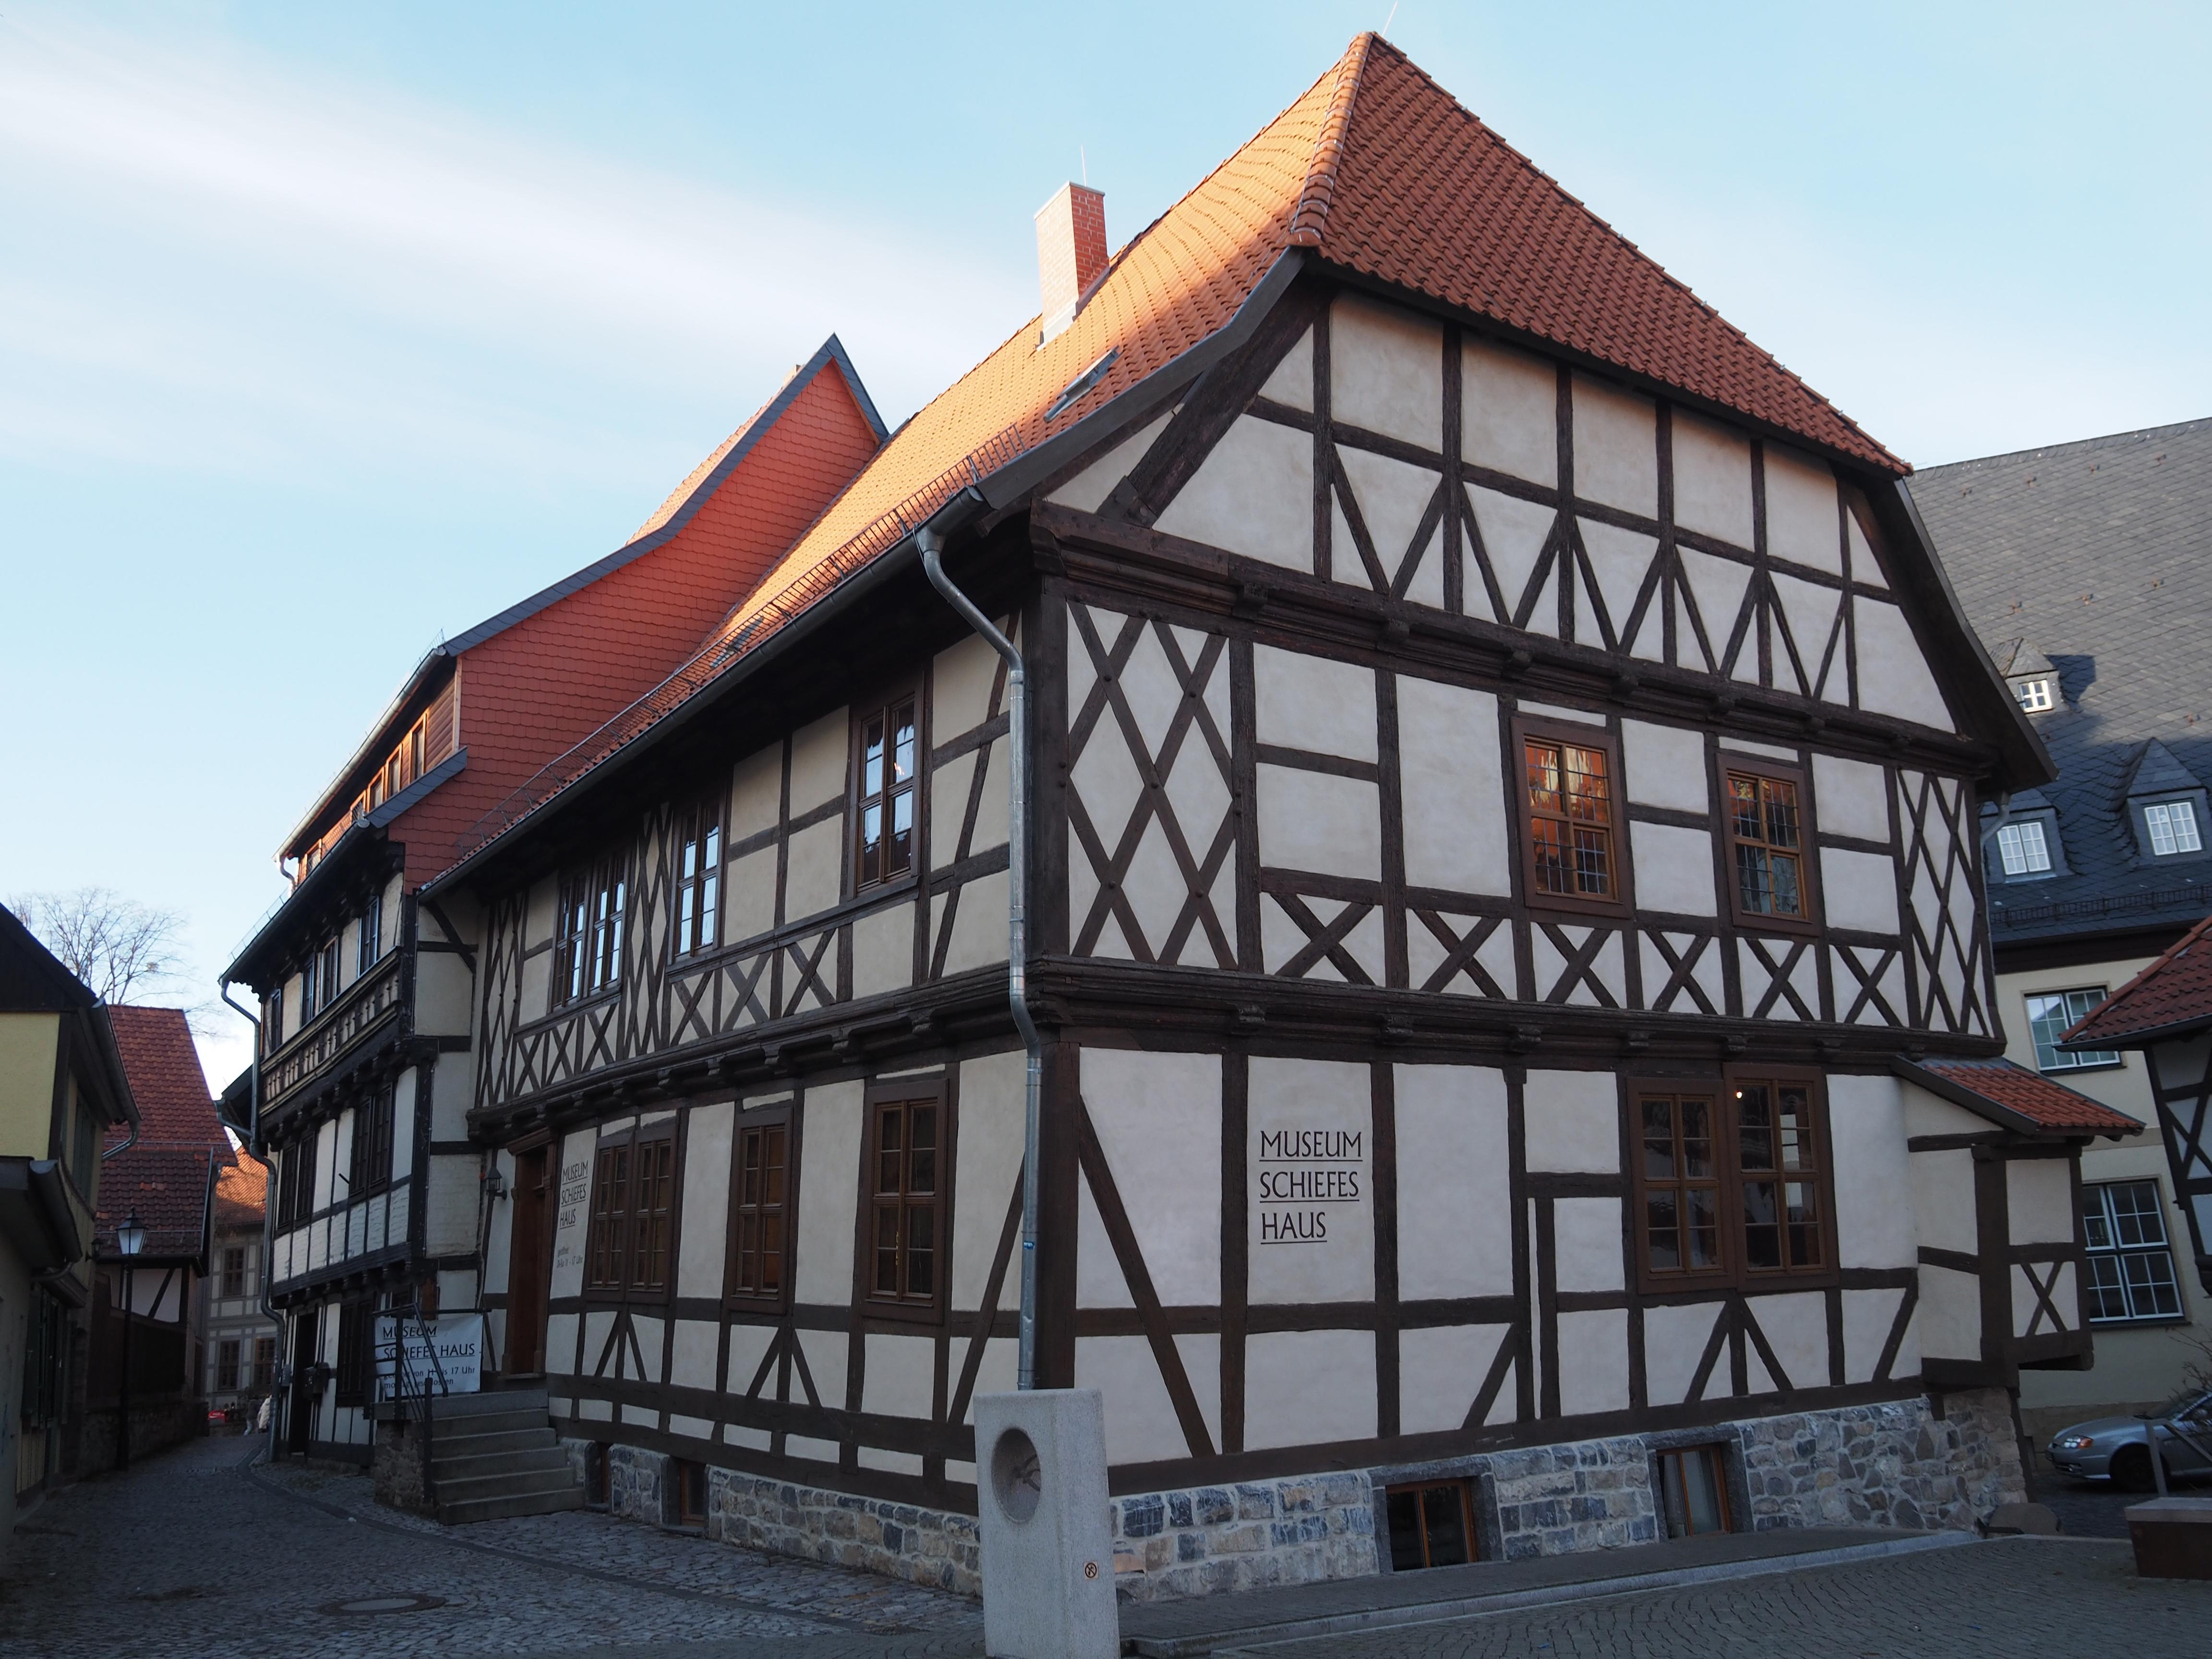 Datei:Wernigerode Museum Schiefes Haus (2).JPG – Wikipedia